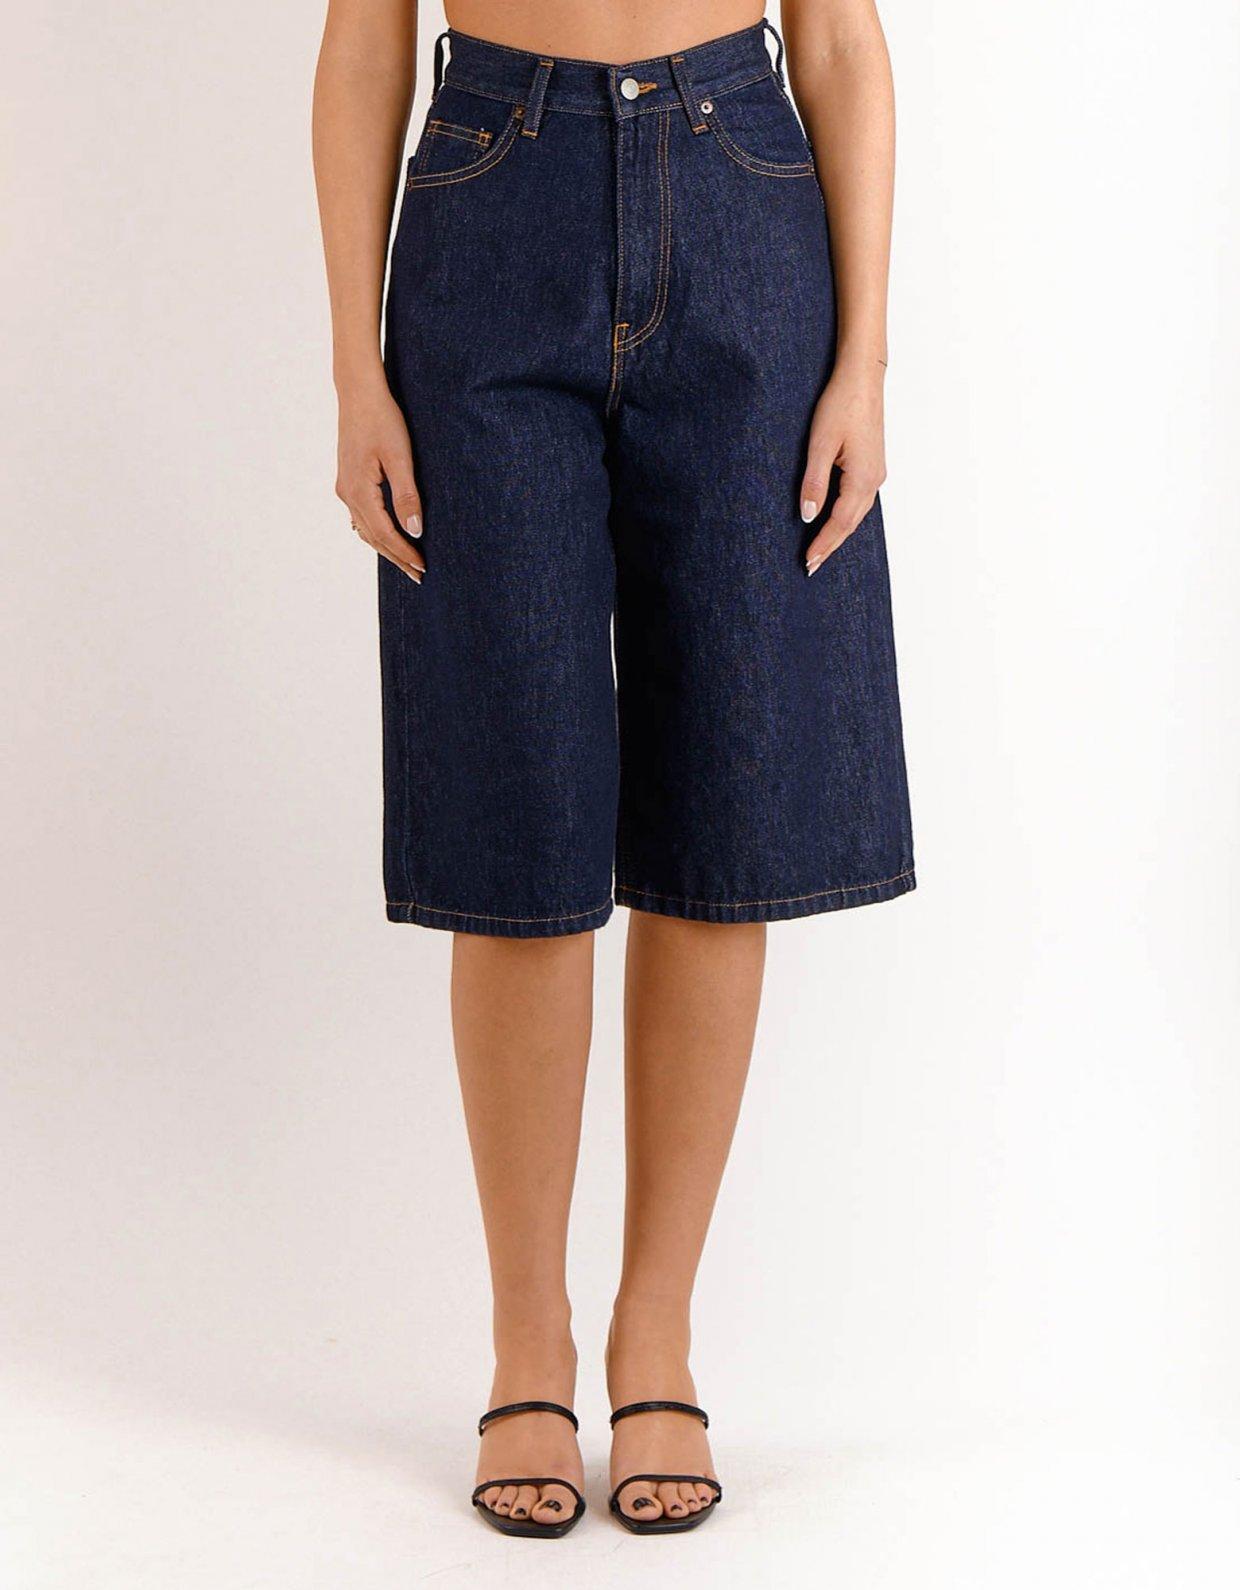 Salt & Pepper Serena raw bermuda shorts